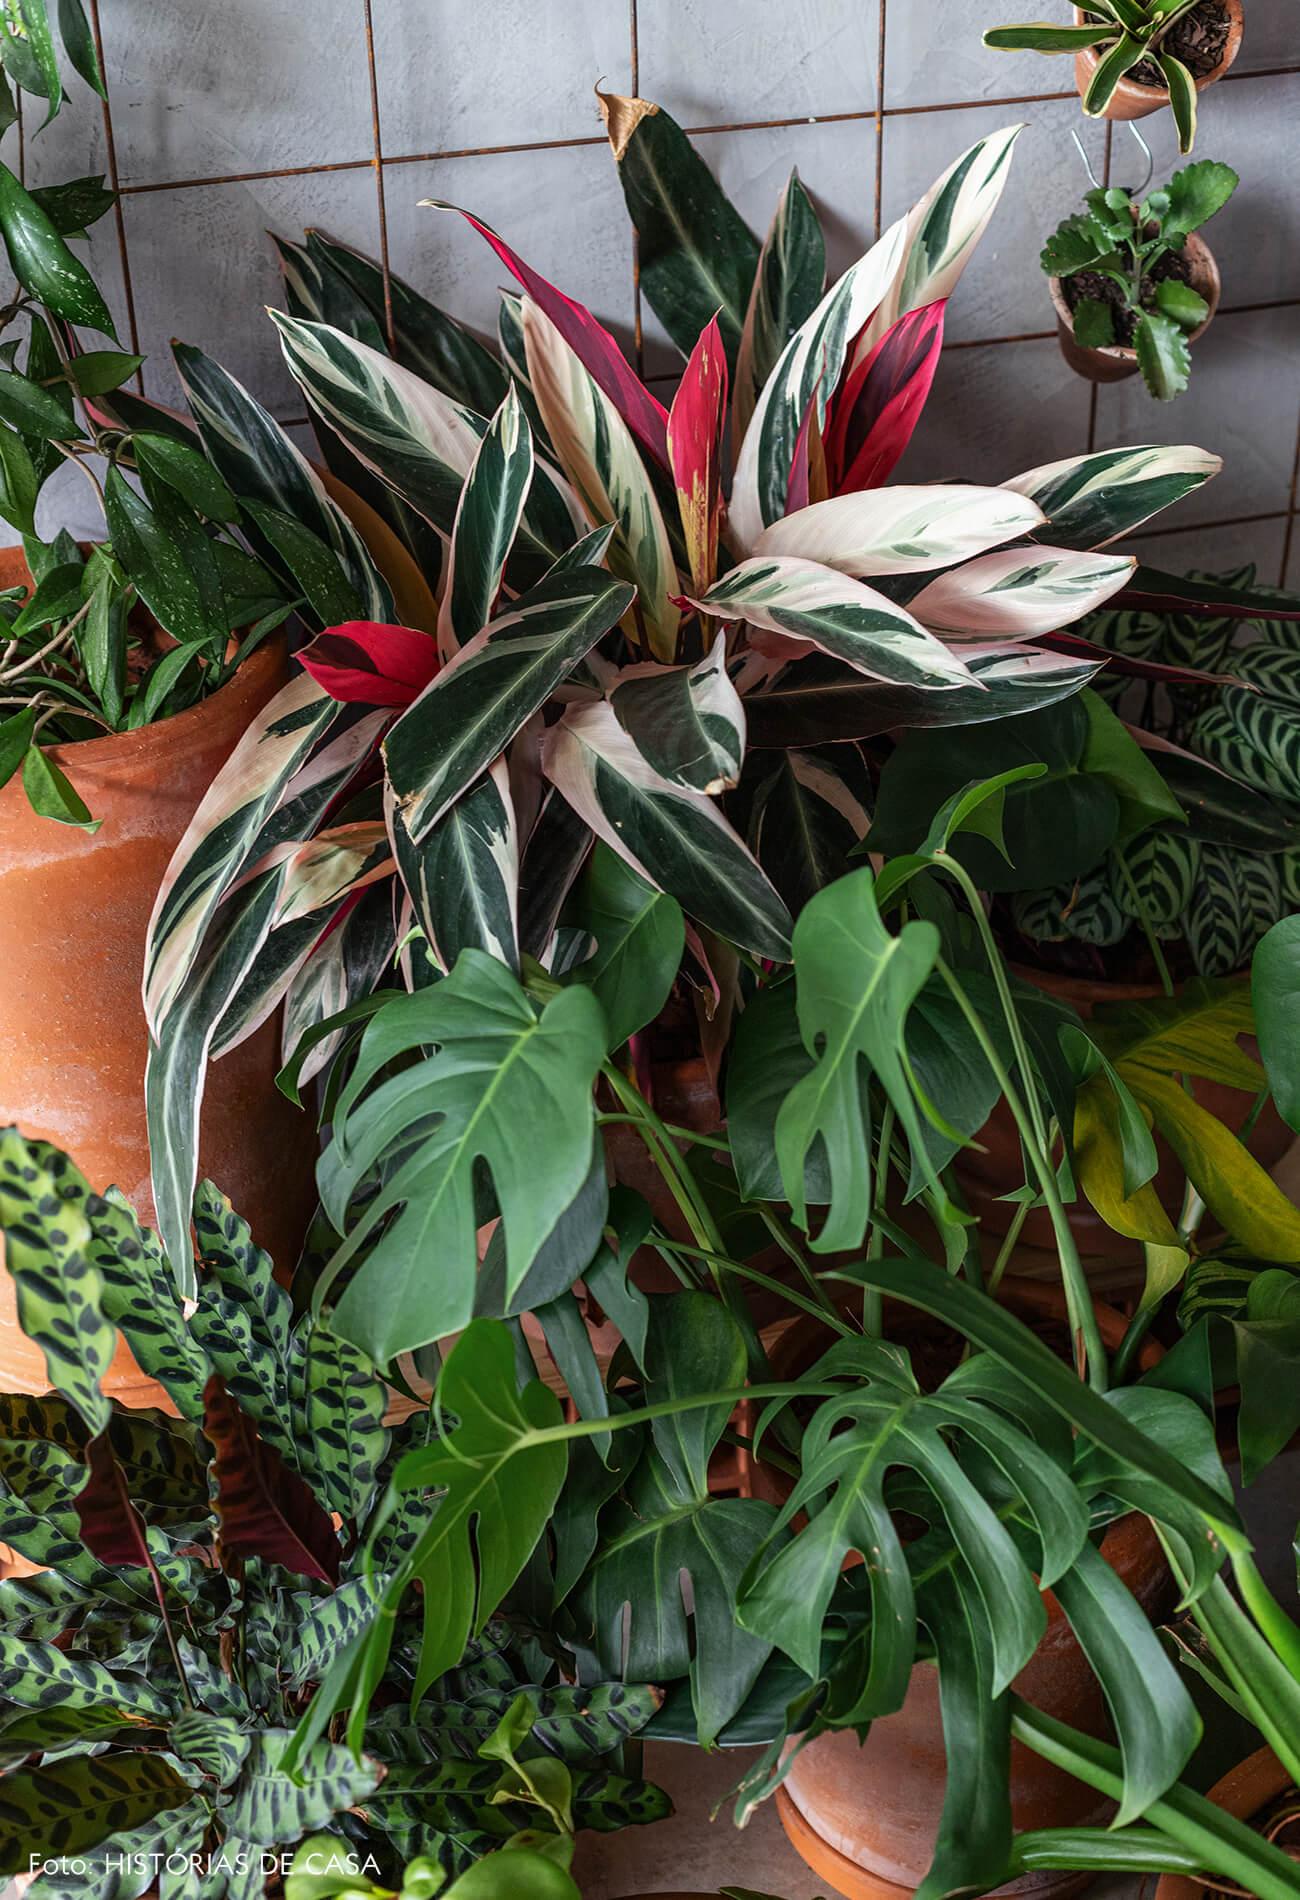 Apartamento pequeno no Copan, plantas em casa, vasos de barro